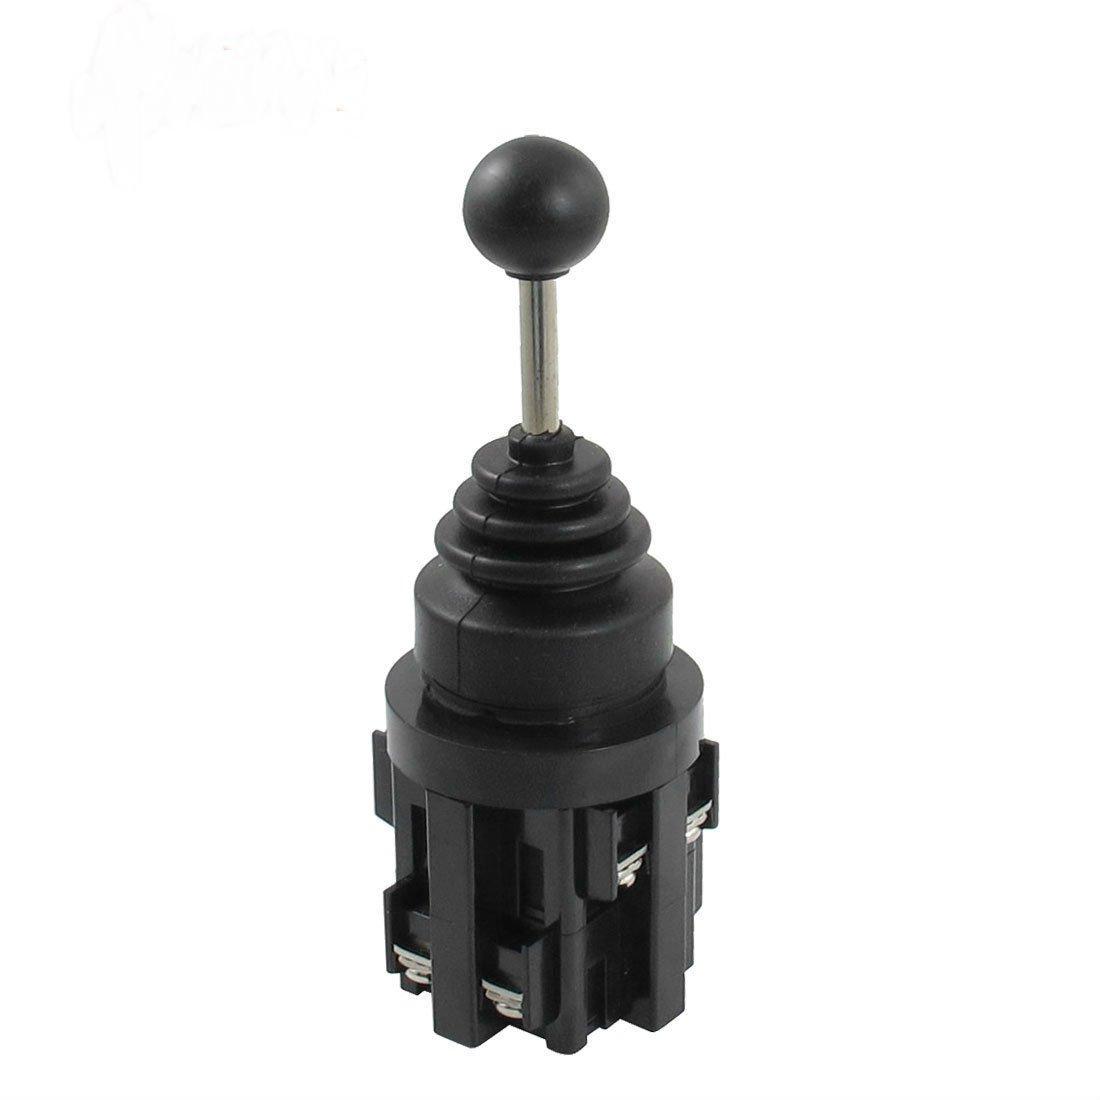 SPST 4NO Four Position Momentary Monolever Joystick Switch 600V db